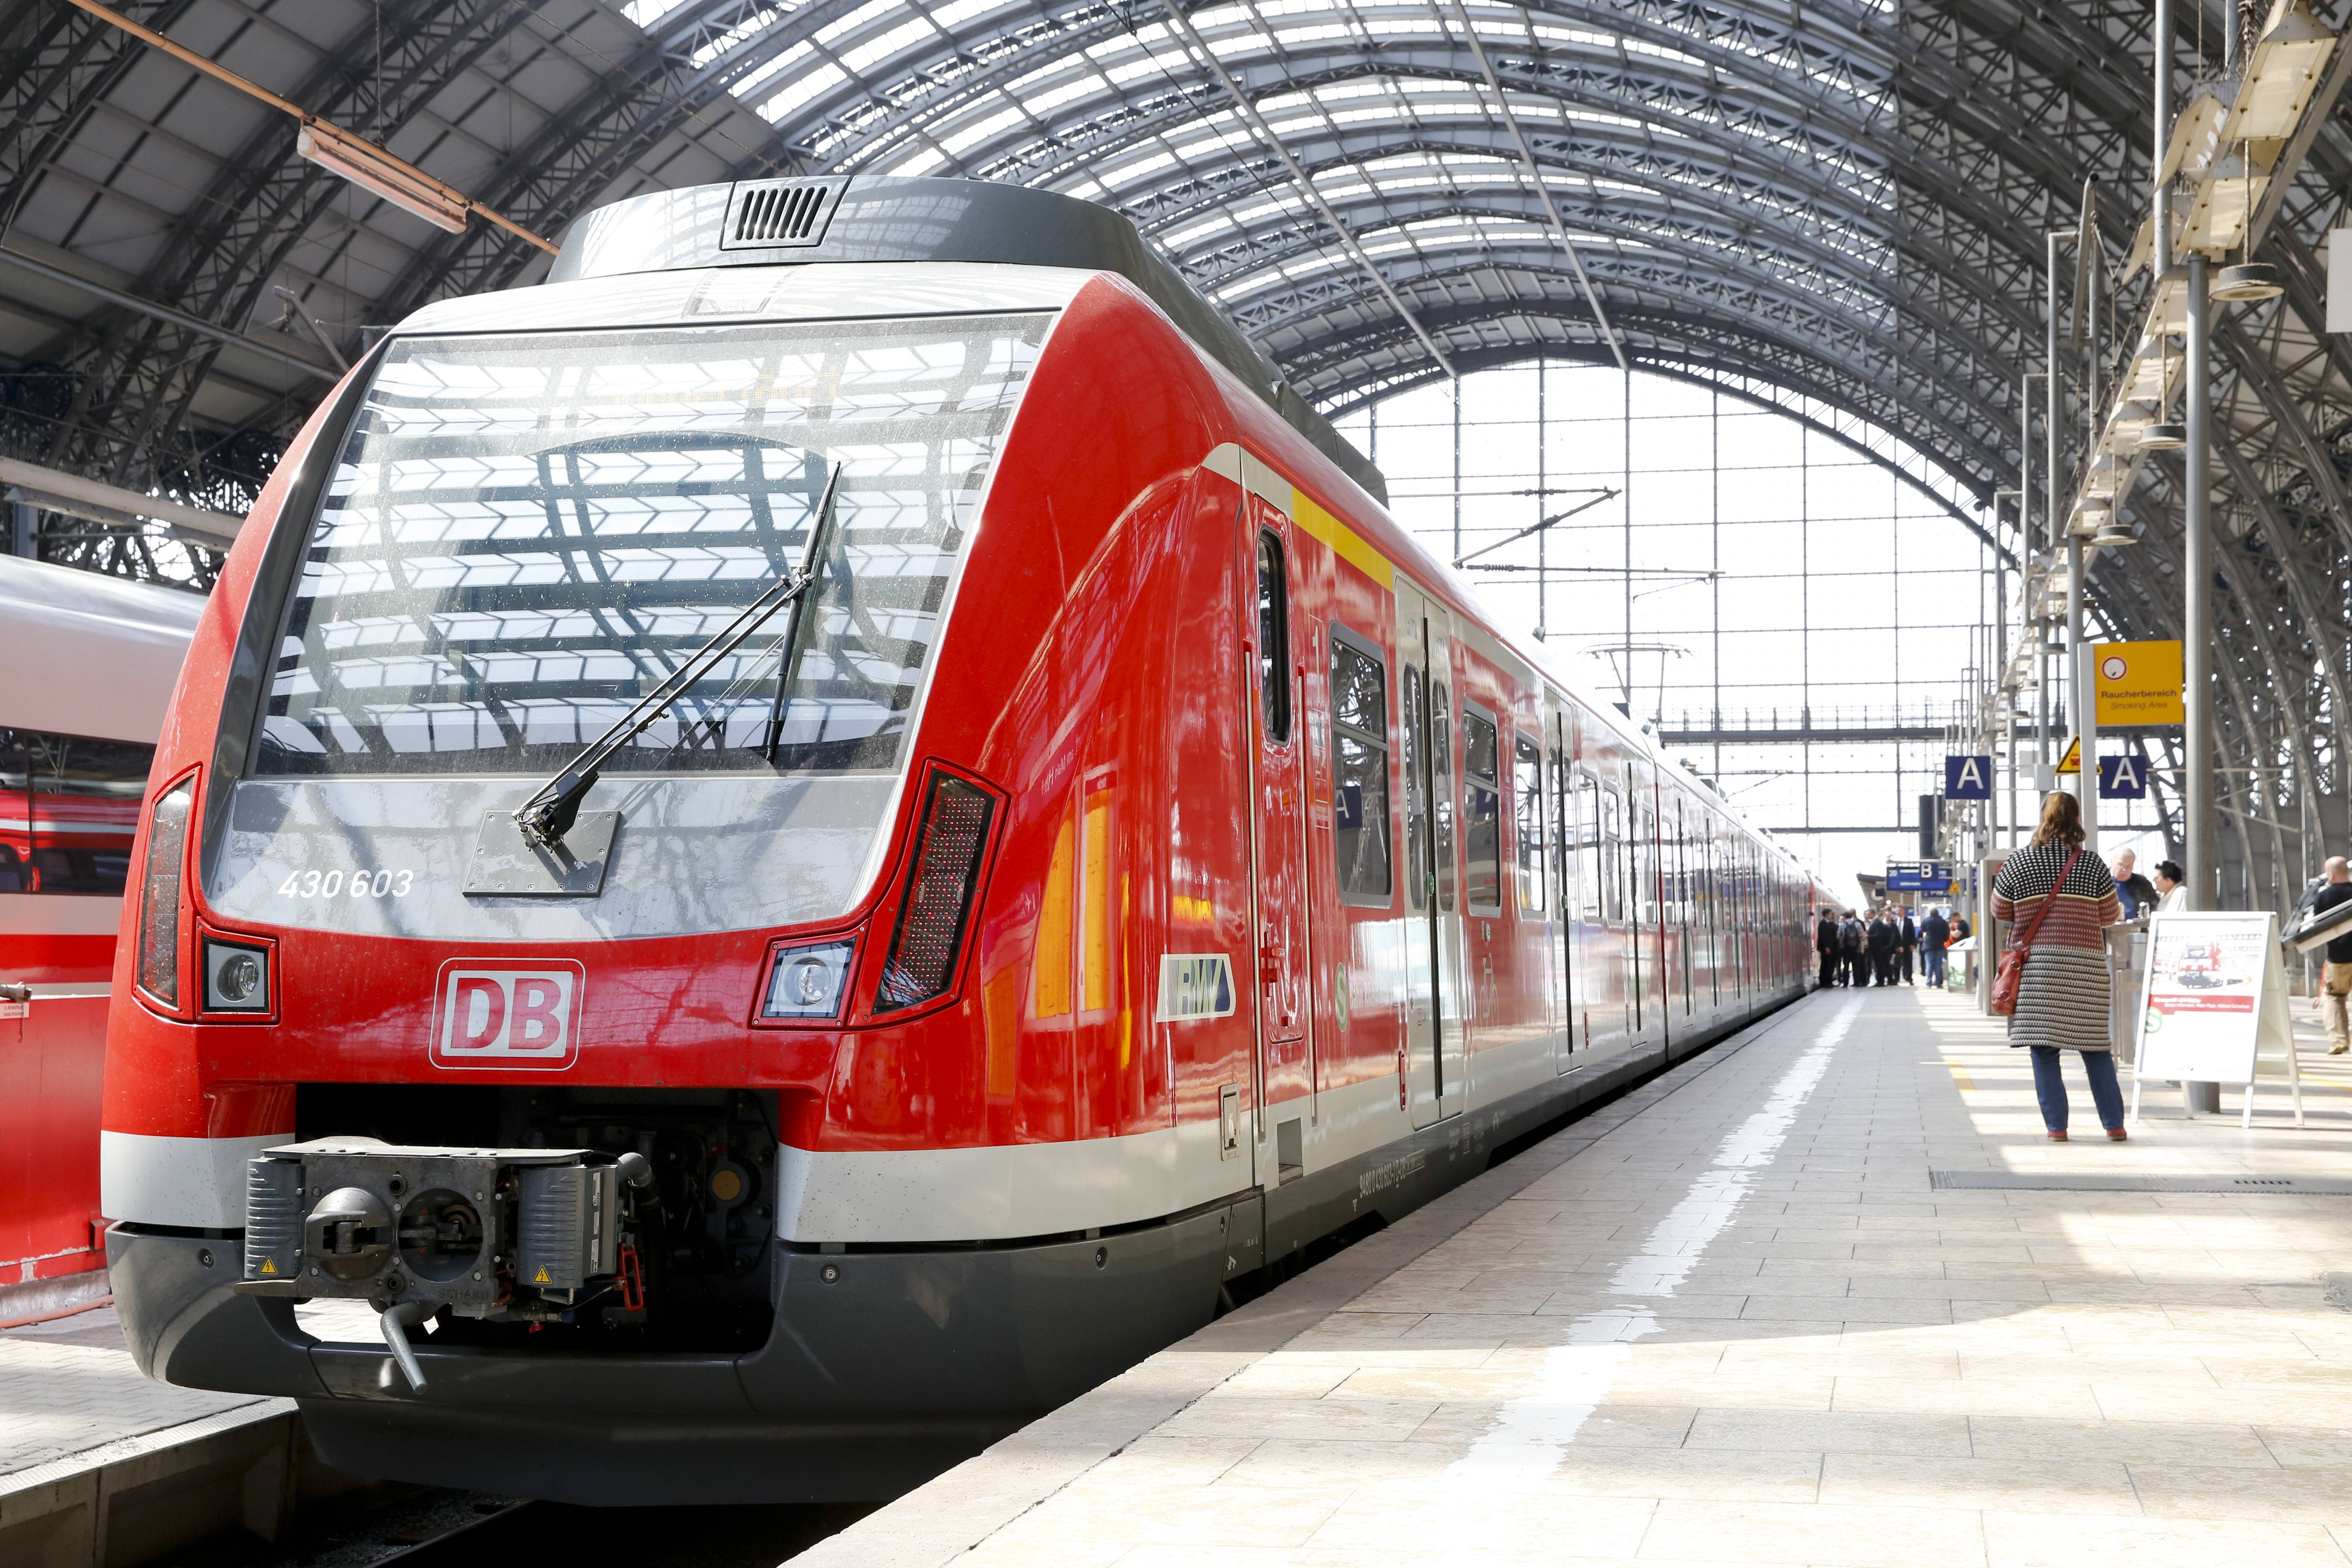 Транспорт мюнхена: виды транспорта, тарифные зоны, цены